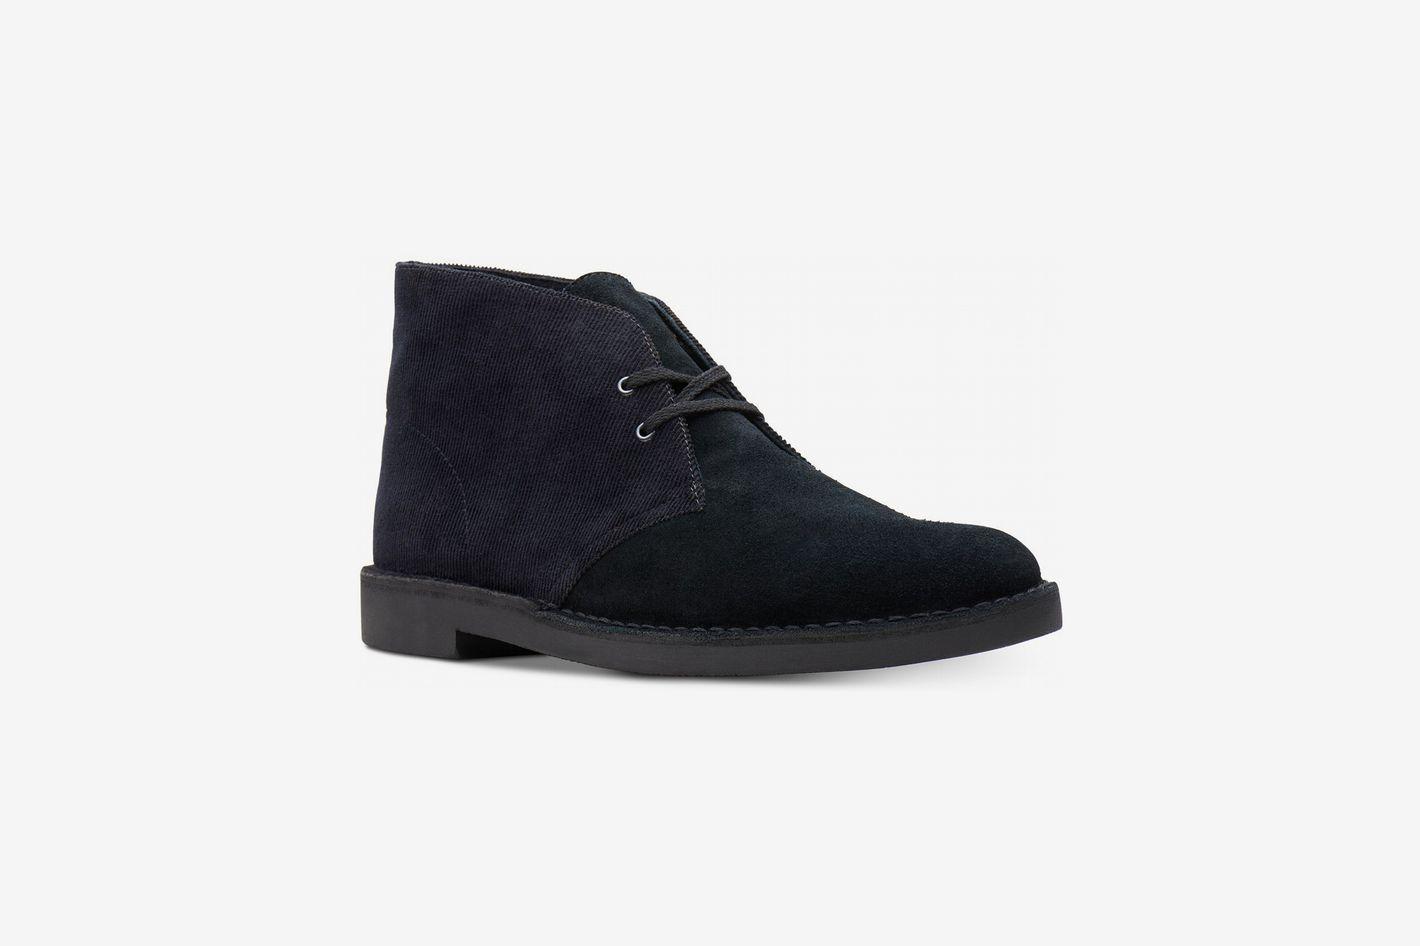 Clarks Men's Limited Edition Corduroy Bushacre Chukka Boots